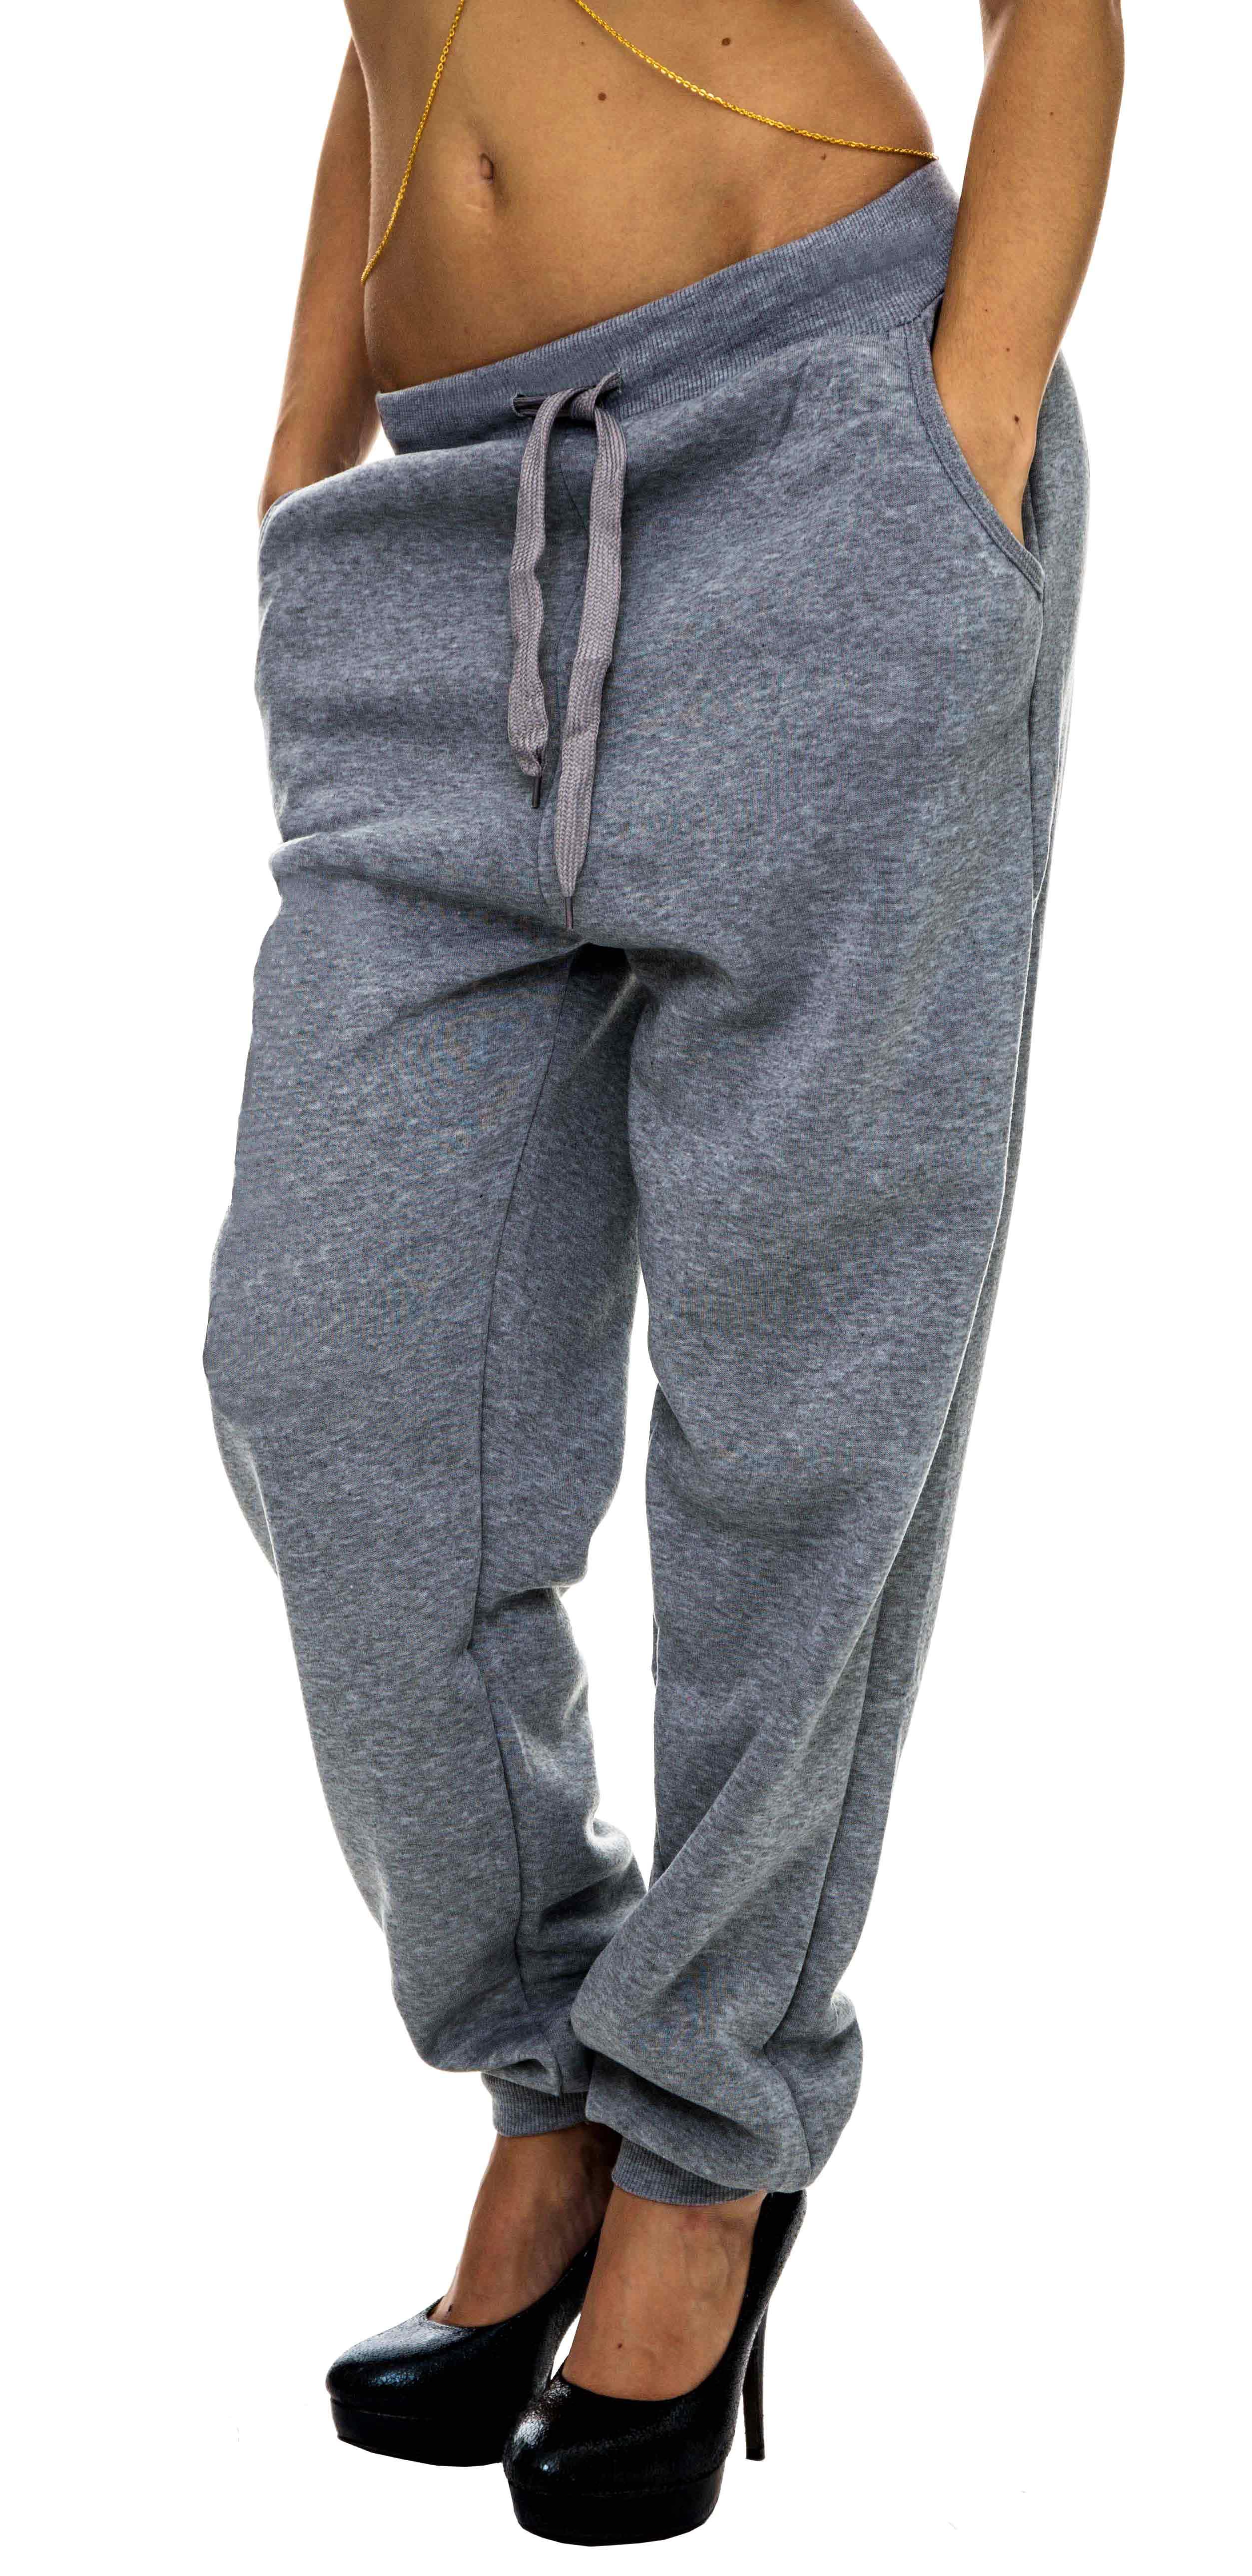 maki damen trainingshose jogginghose sporthose fitness hose sweatpants leggings ebay. Black Bedroom Furniture Sets. Home Design Ideas